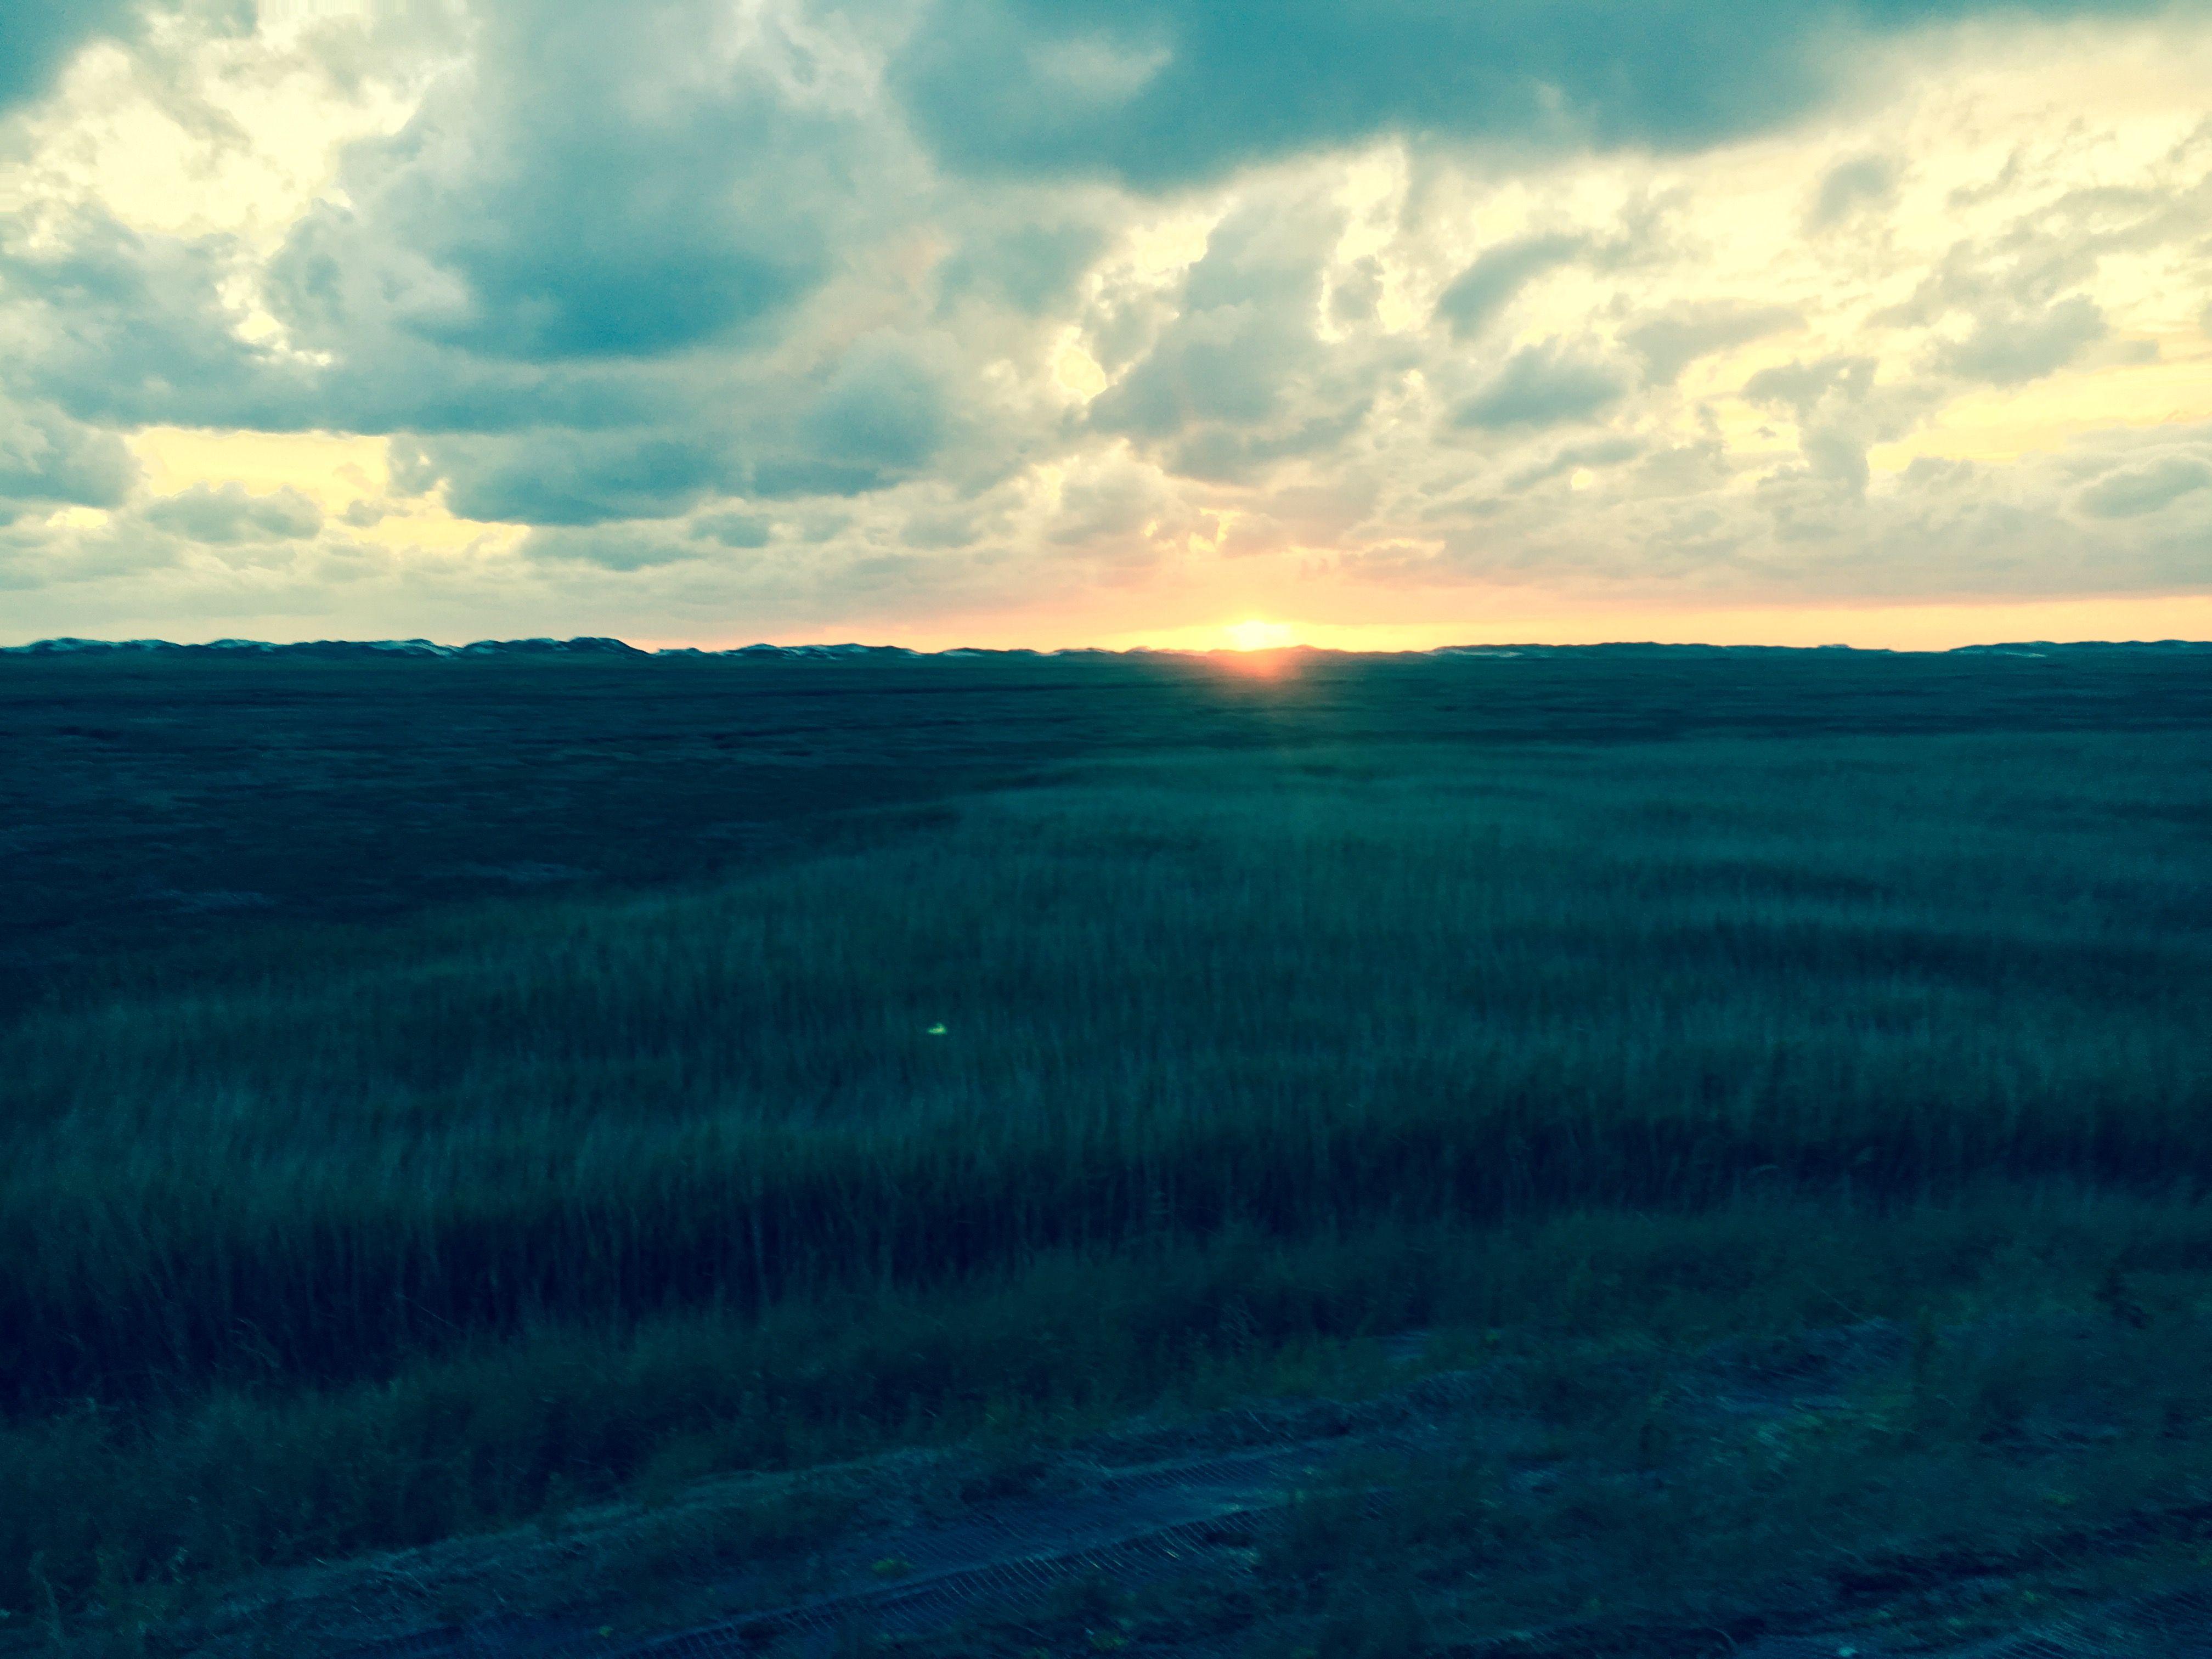 Strand nordsee sonnenuntergang  SPO Sonnenuntergang #spo #daskubatzski #strand #meer #nordsee ...